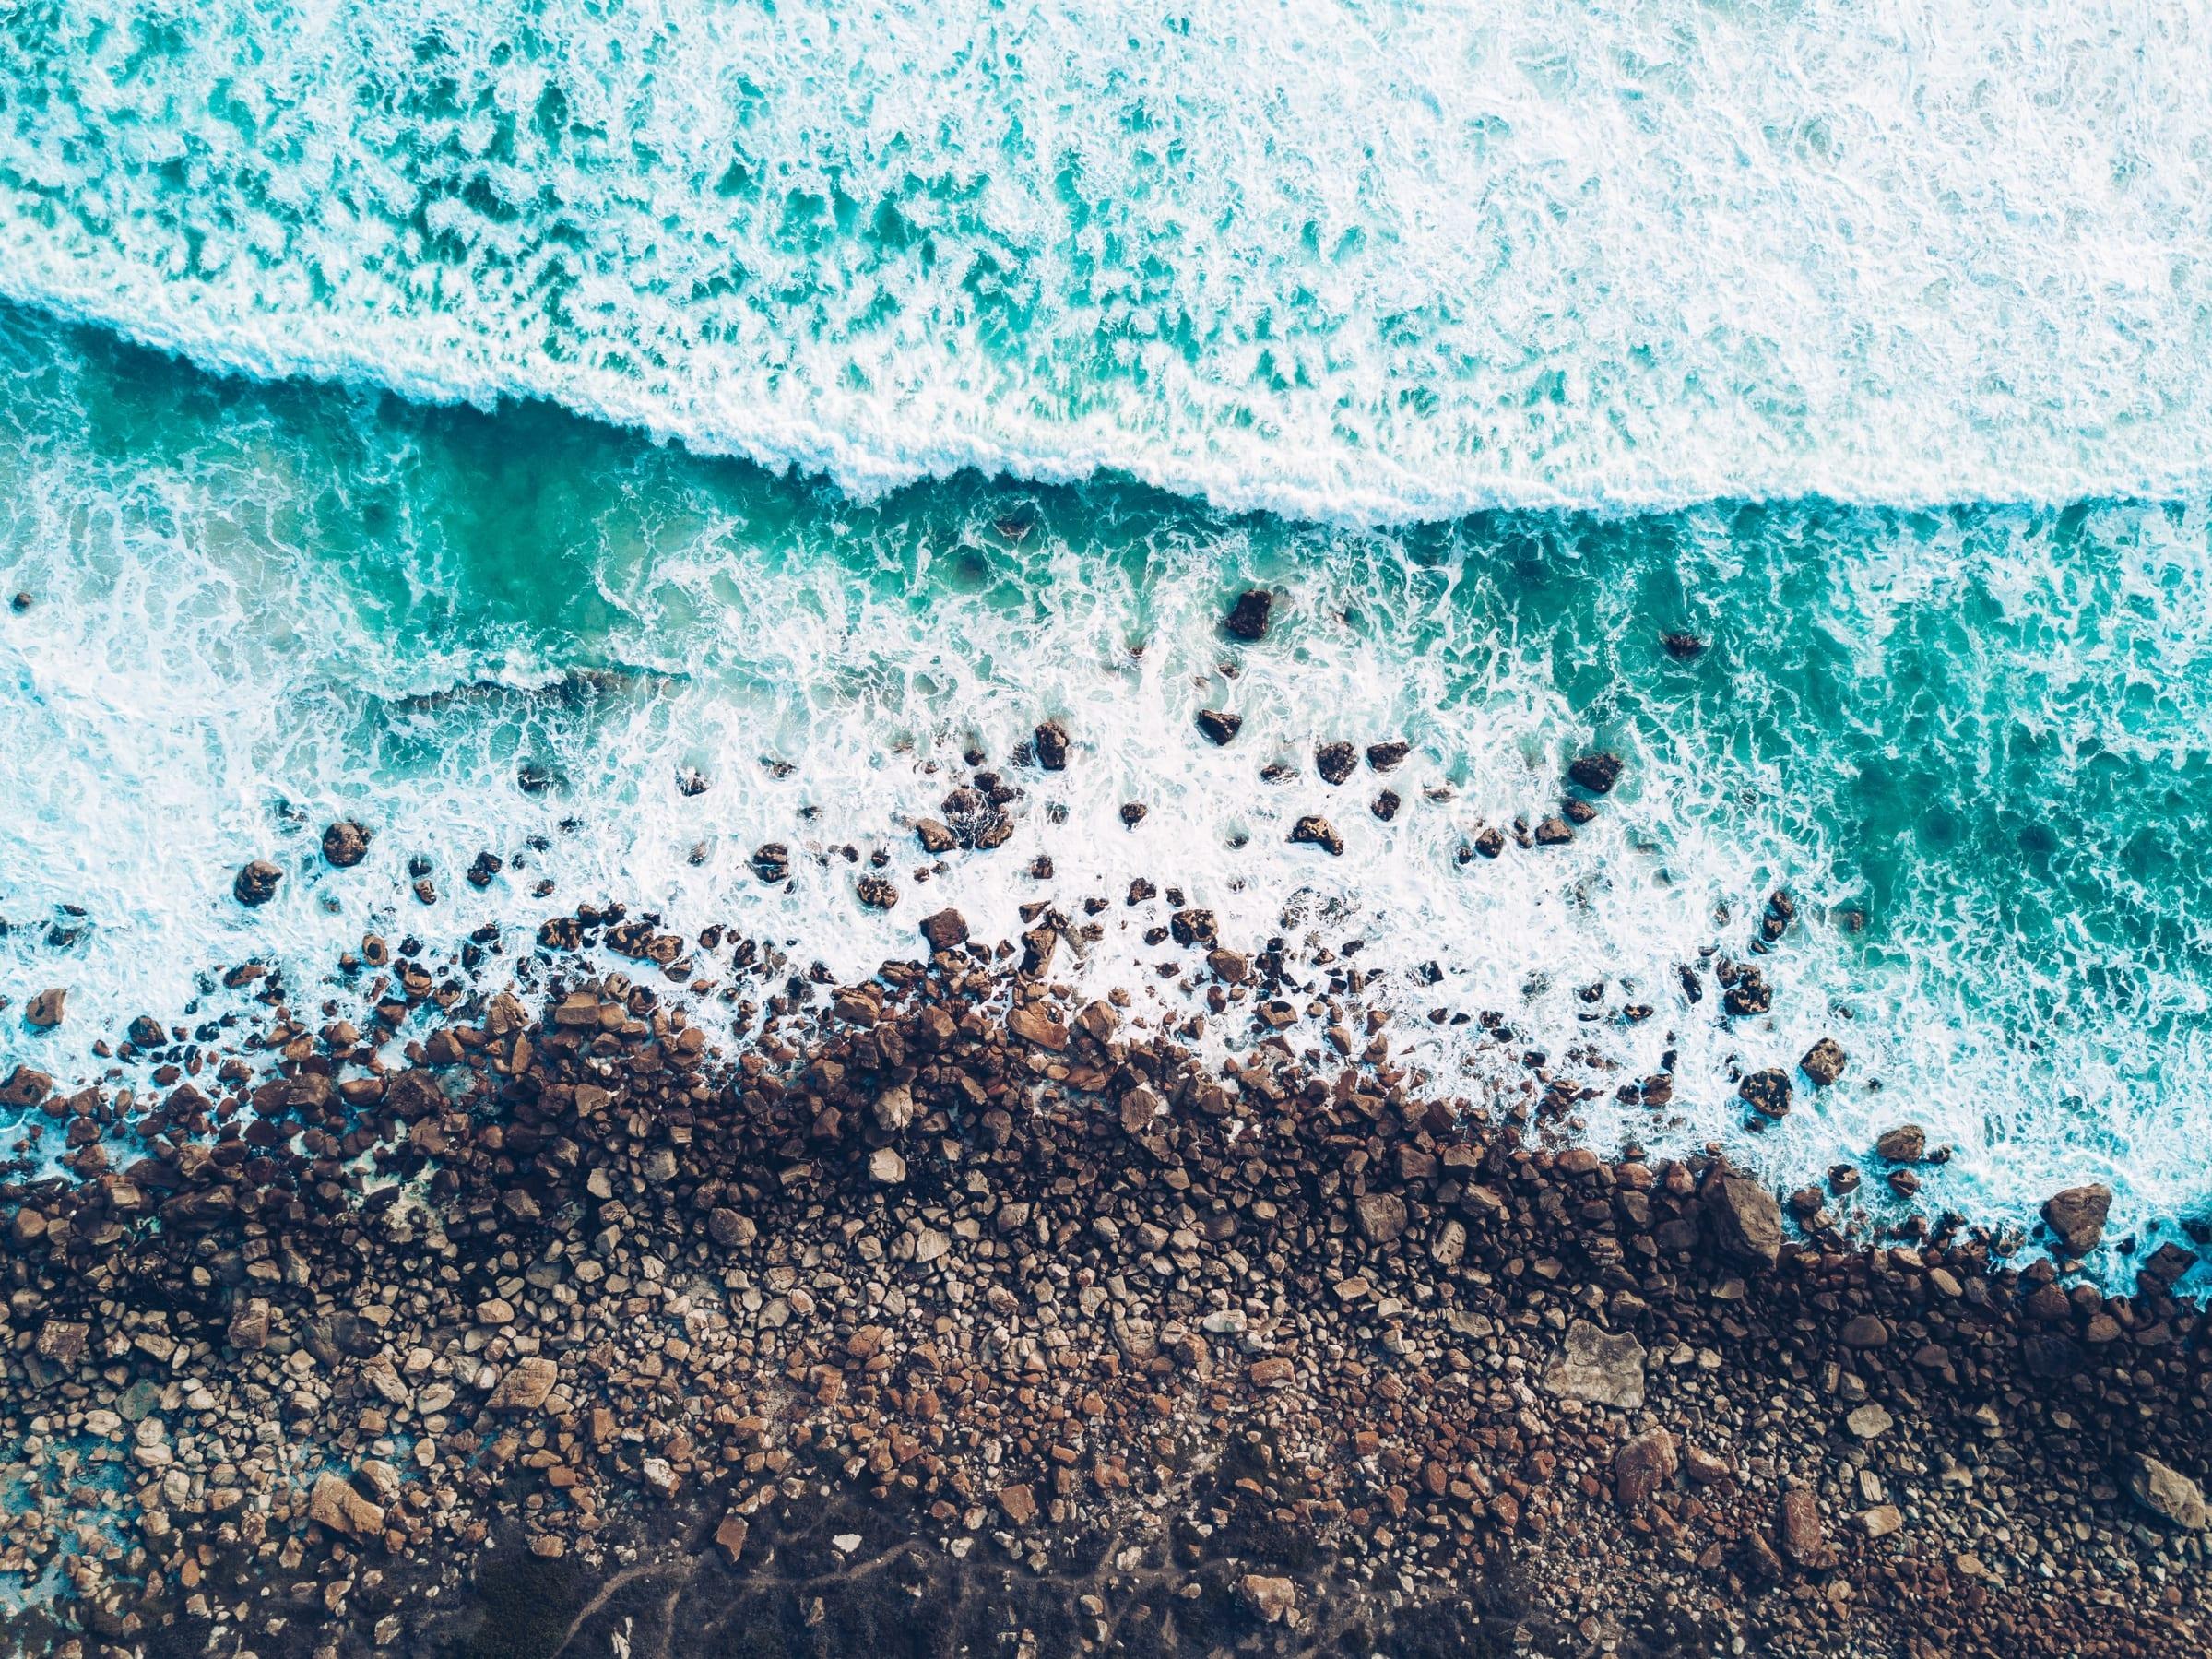 An image of waves hitting the stoney edge of a beach by @johnonolan on unsplash.